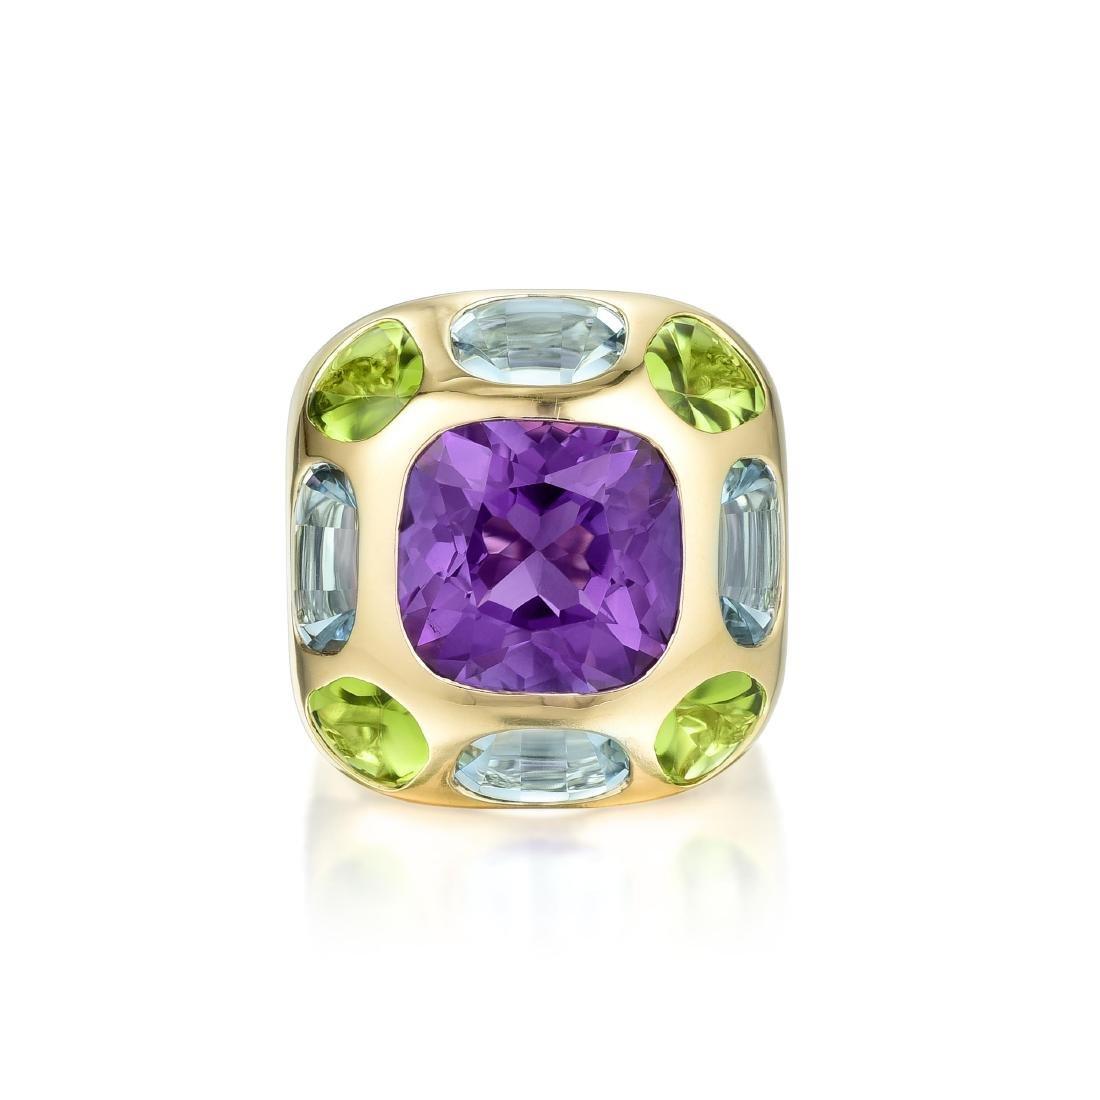 Chanel Amethyst Peridot and Aquamarine Ring